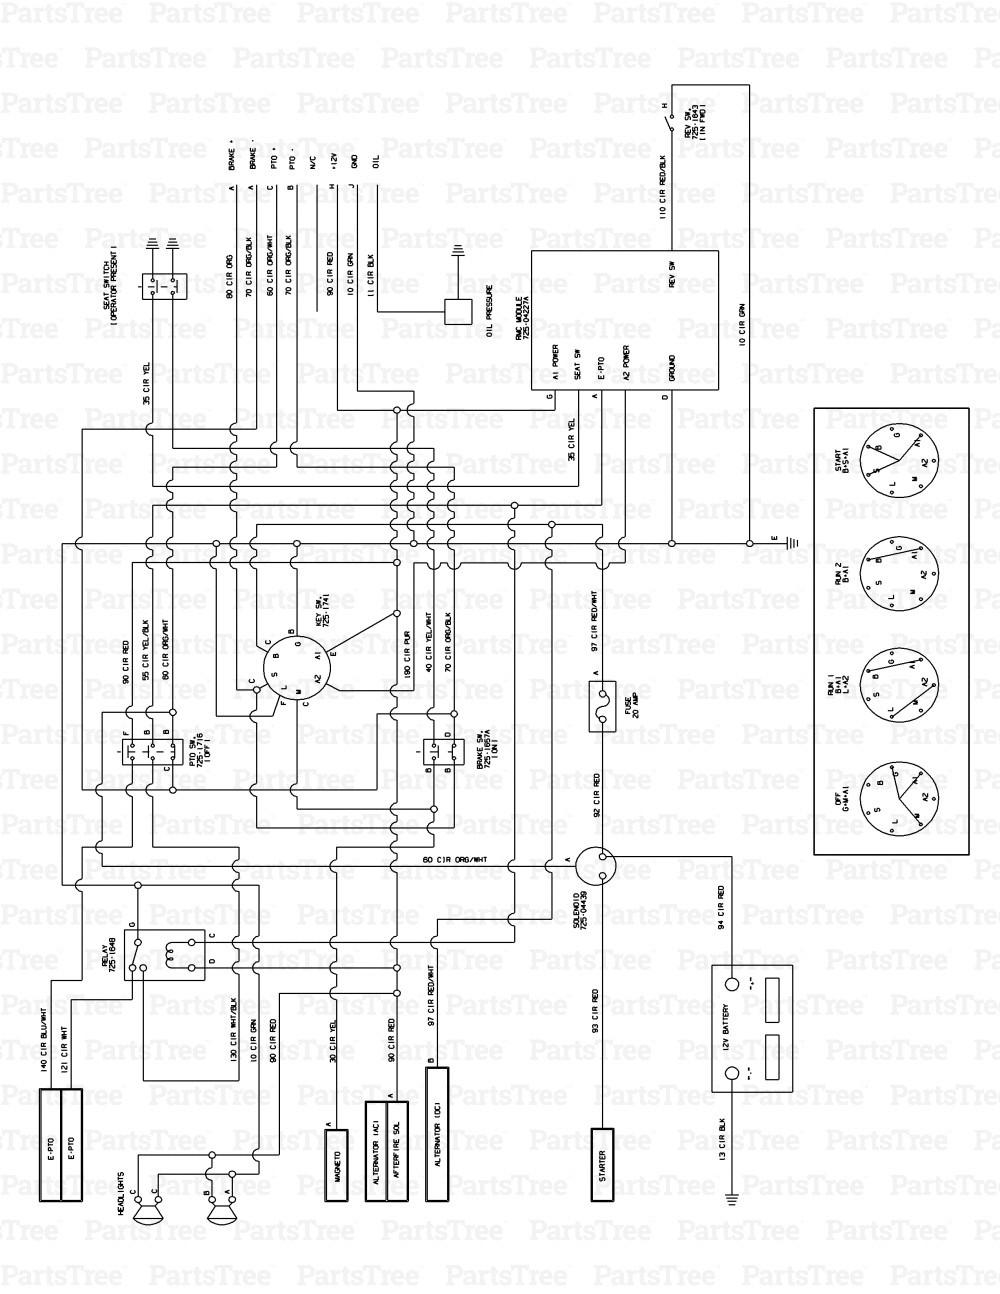 Cub Cadet 107 Wiring Diagram | Online Wiring Diagram on cub cadet lt1045 wiring-diagram, cub cadet 1641 wiring-diagram, cub cadet 2166 wiring-diagram, cub cadet 1450 wiring-diagram, cub cadet 1862 wiring-diagram, cub cadet 1210 hydro diagrams, cub cadet electrical schematics, cub cadet lt1046 wiring-diagram, cub cadet 1650 wiring-diagram, cub cadet 1045 wiring-diagram, cub cadet 2155 wiring-diagram, cub cadet lt1050 wiring-diagram, cub cadet 1042 wiring-diagram, cub cadet 104 wiring-diagram, cub cadet 1330 wiring-diagram, cub cadet 149 wiring-diagram, cub cadet lt1018 wiring-diagram, cub cadet schematic diagram, cub cadet electrical diagram, cub cadet 2135 wiring-diagram,